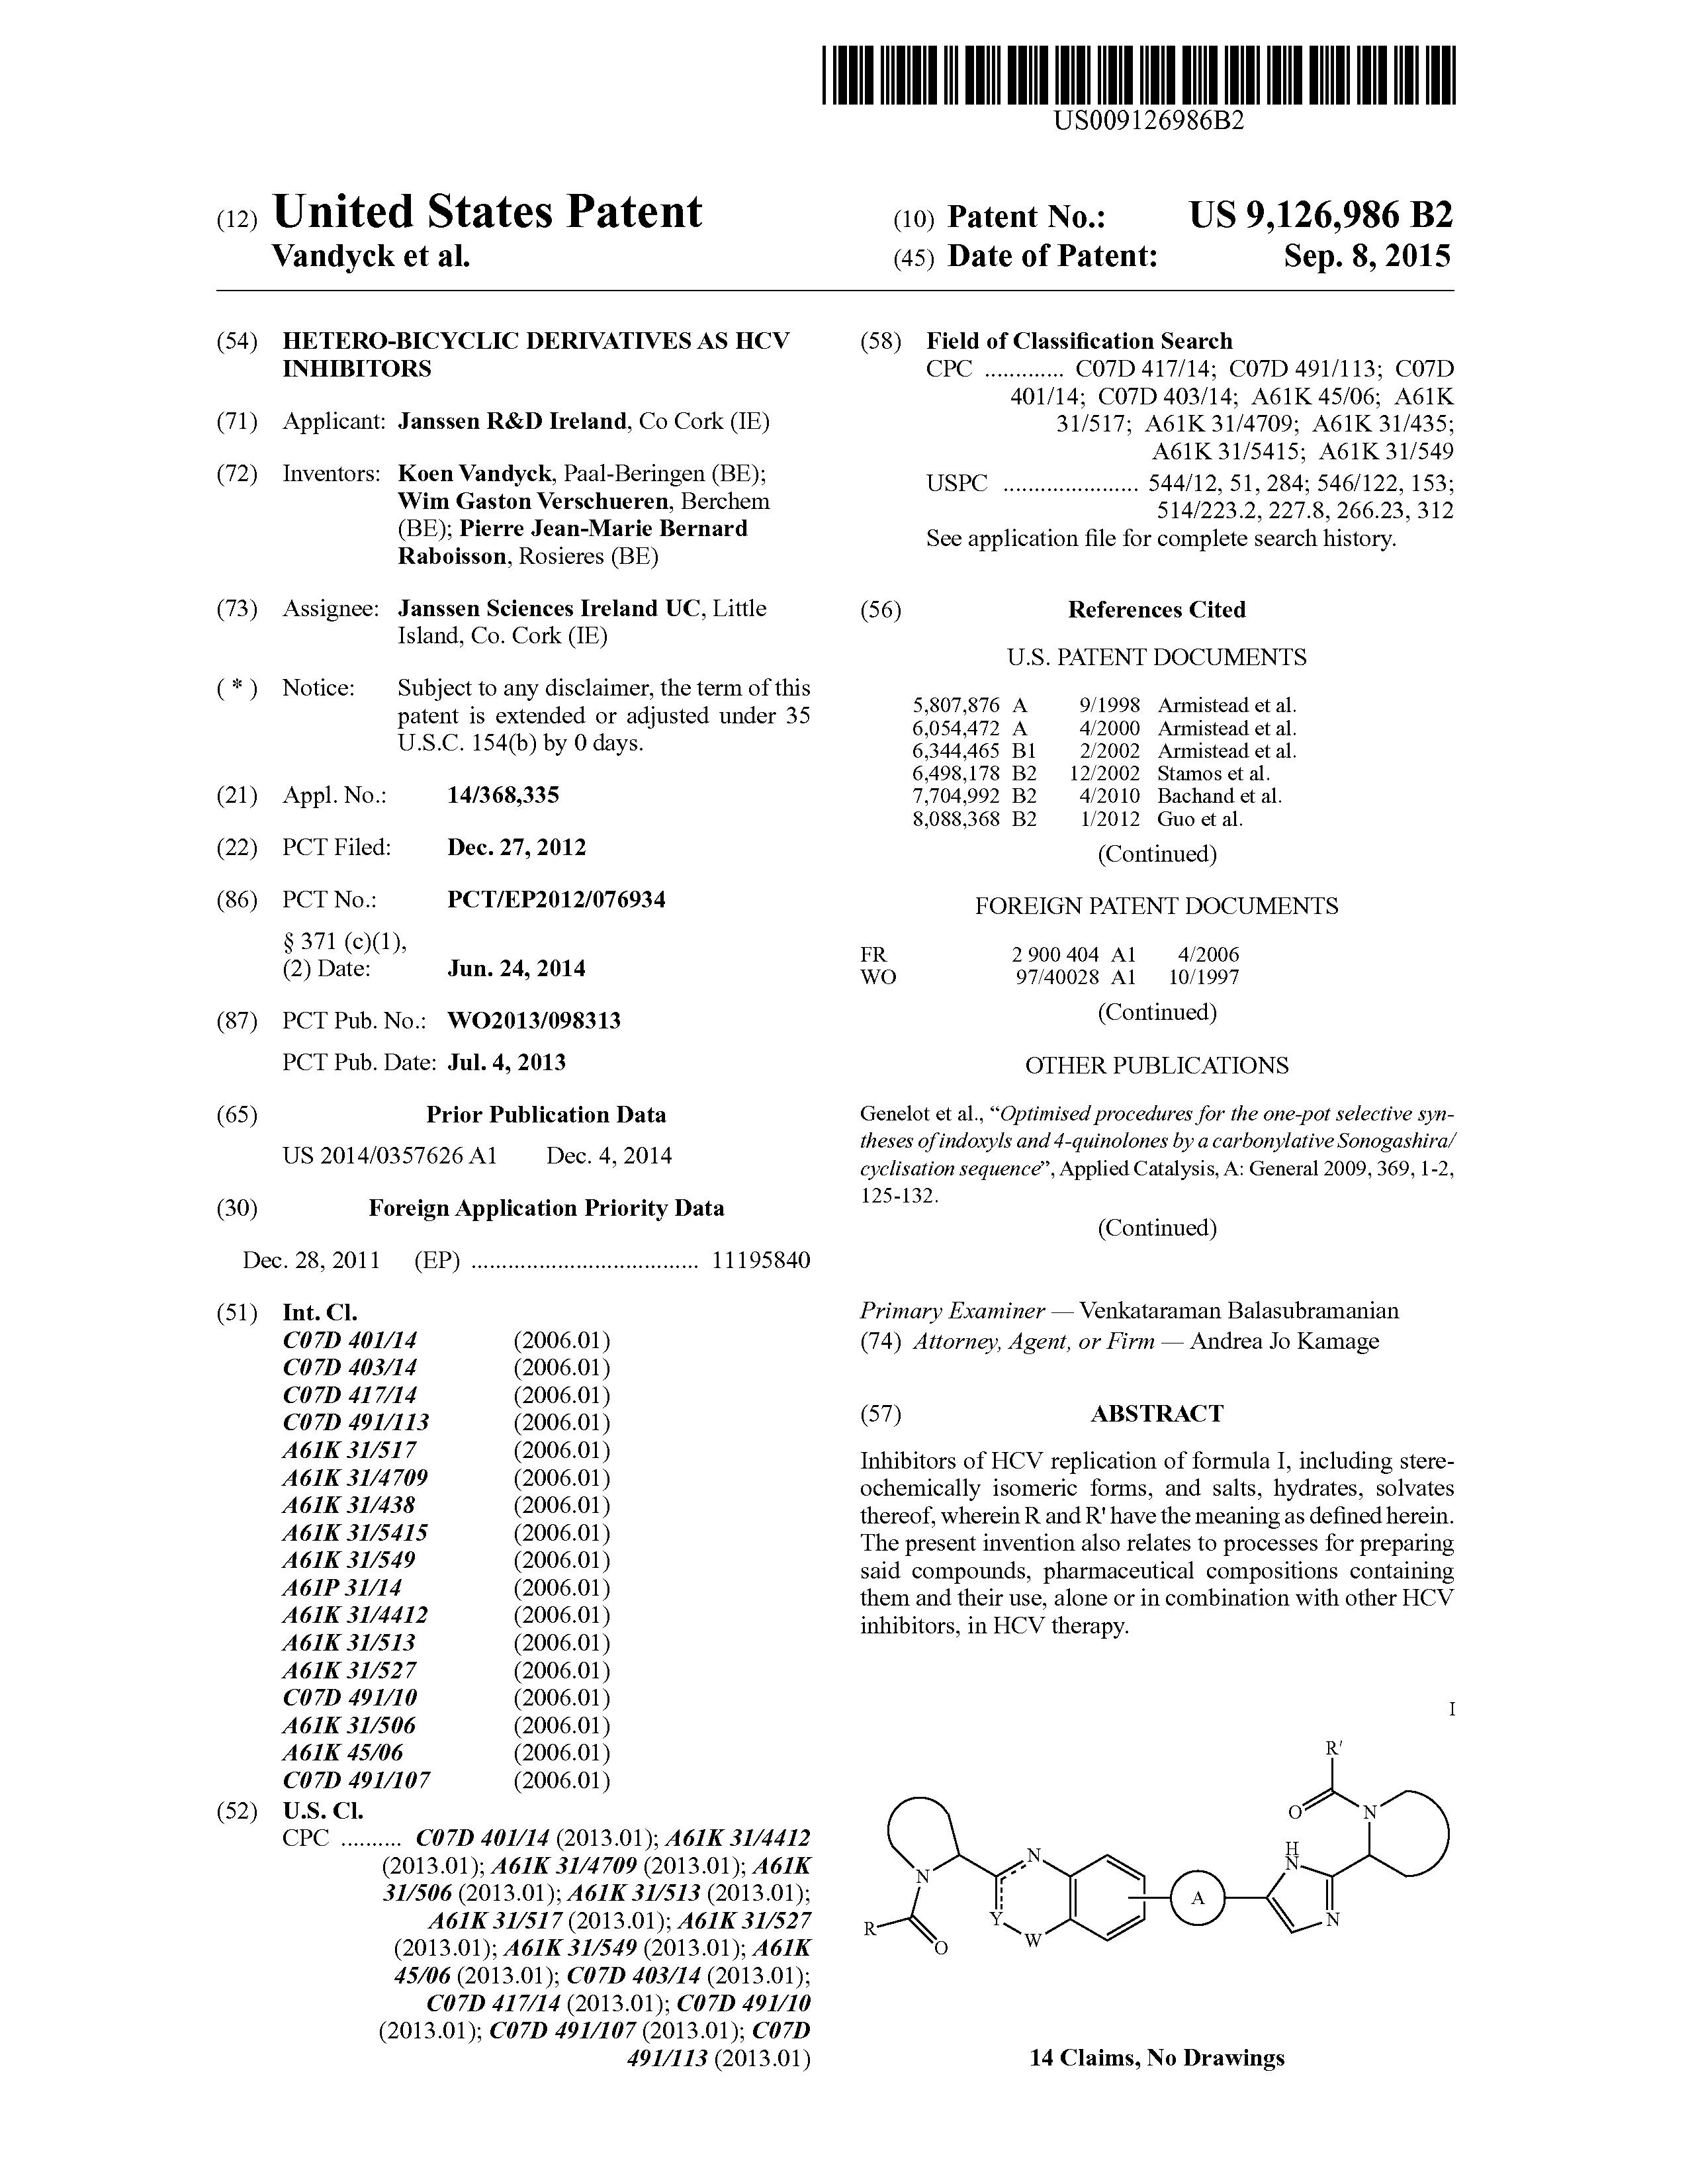 US 9126986 B2 - Hetero-bicyclic Derivatives As Hcv Inhibitors - The